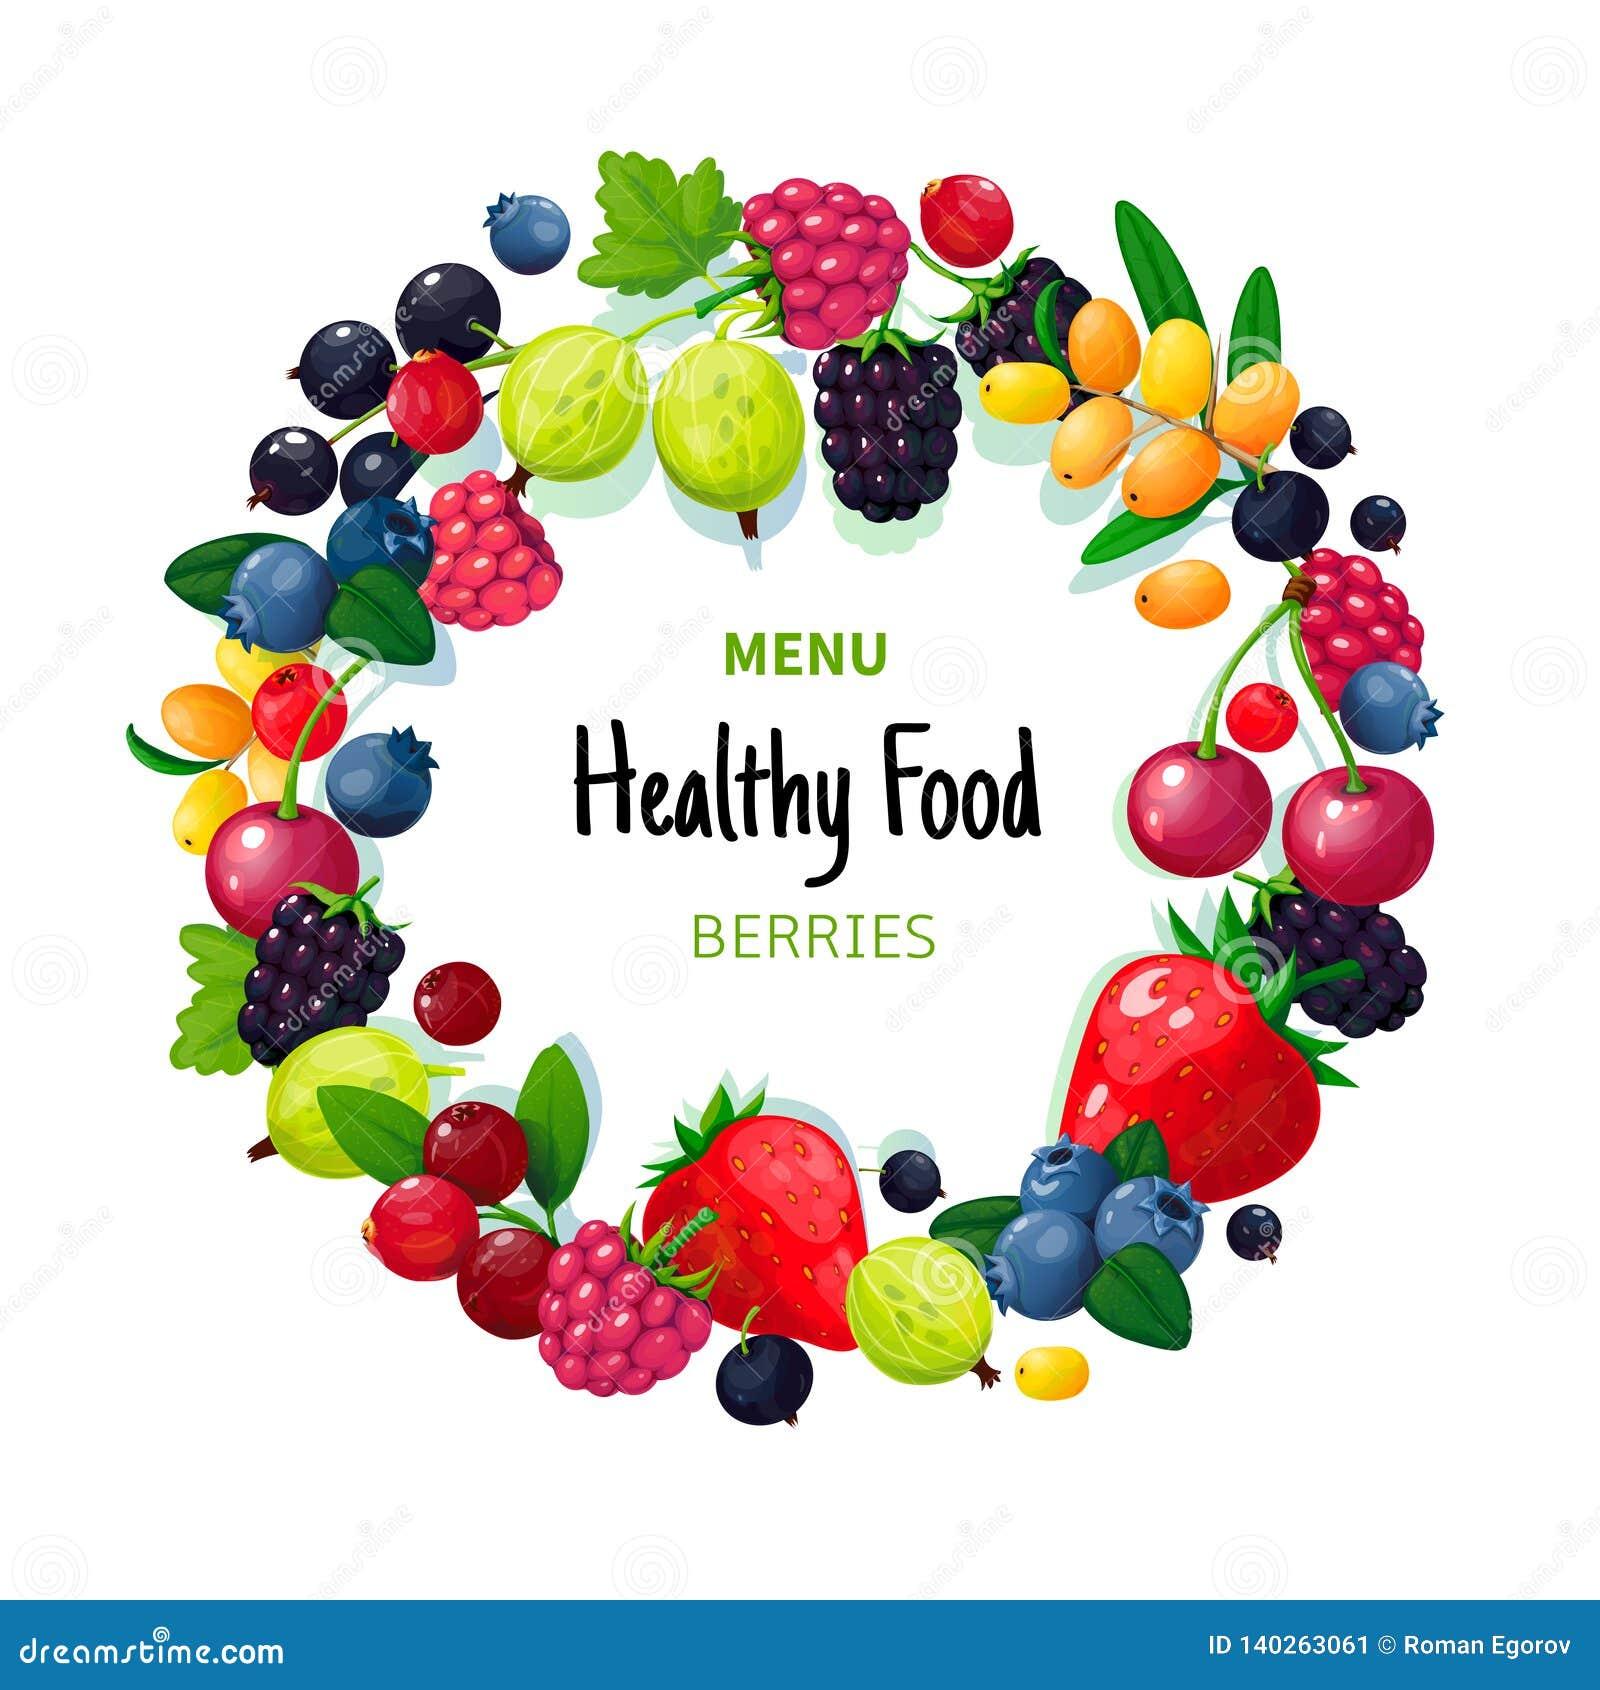 Fresh organic summer berries and fruits. Strawberry blueberry gooseberry blackberry raspberry. Healthy food vegan cafe